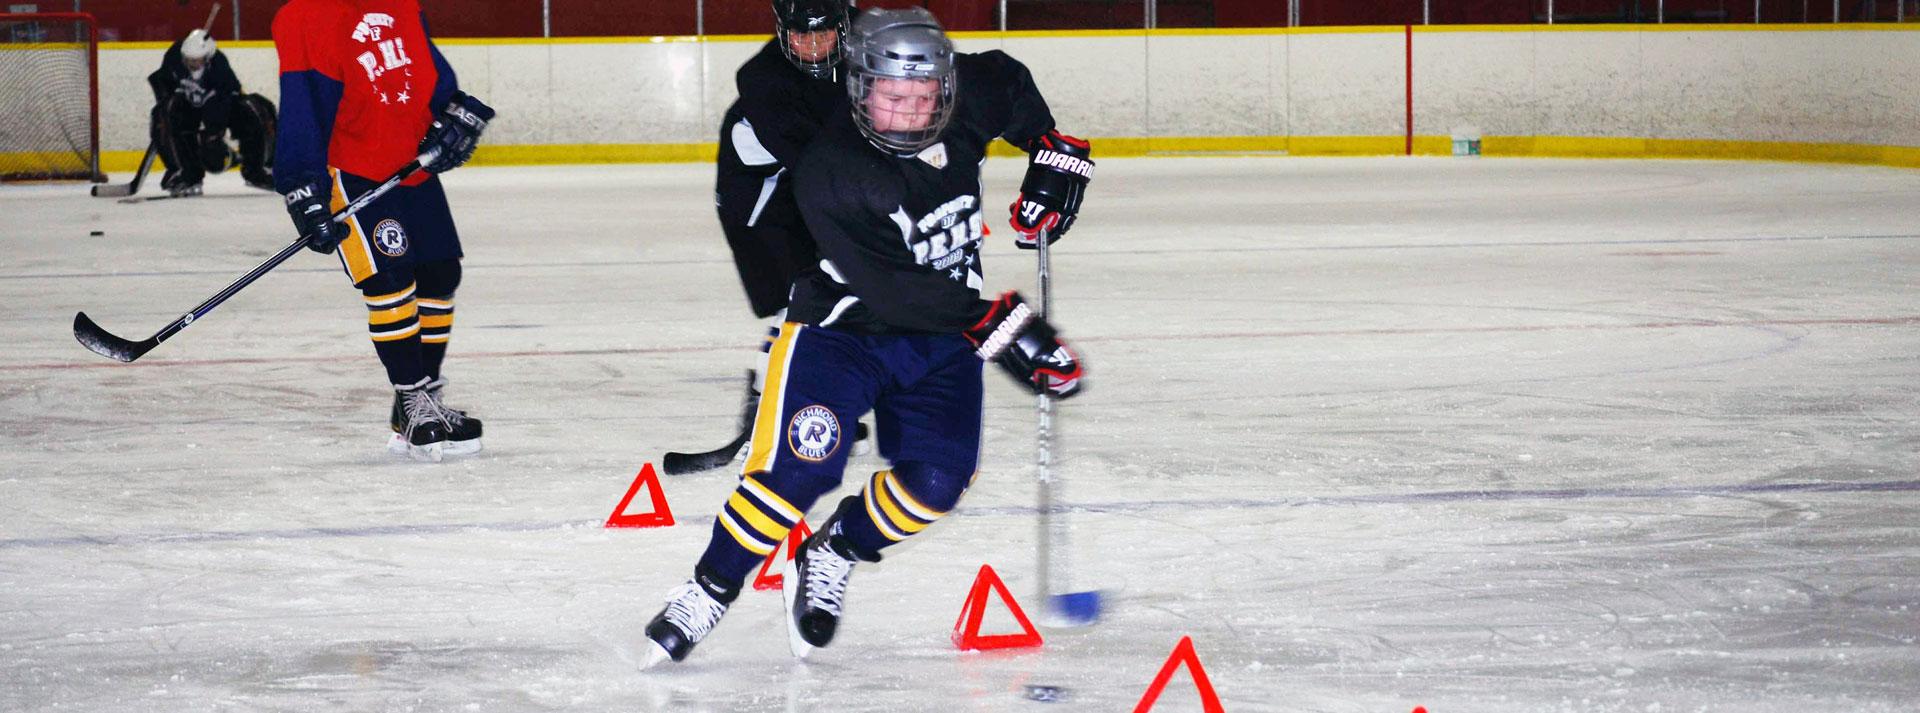 in season hockey training program pdf